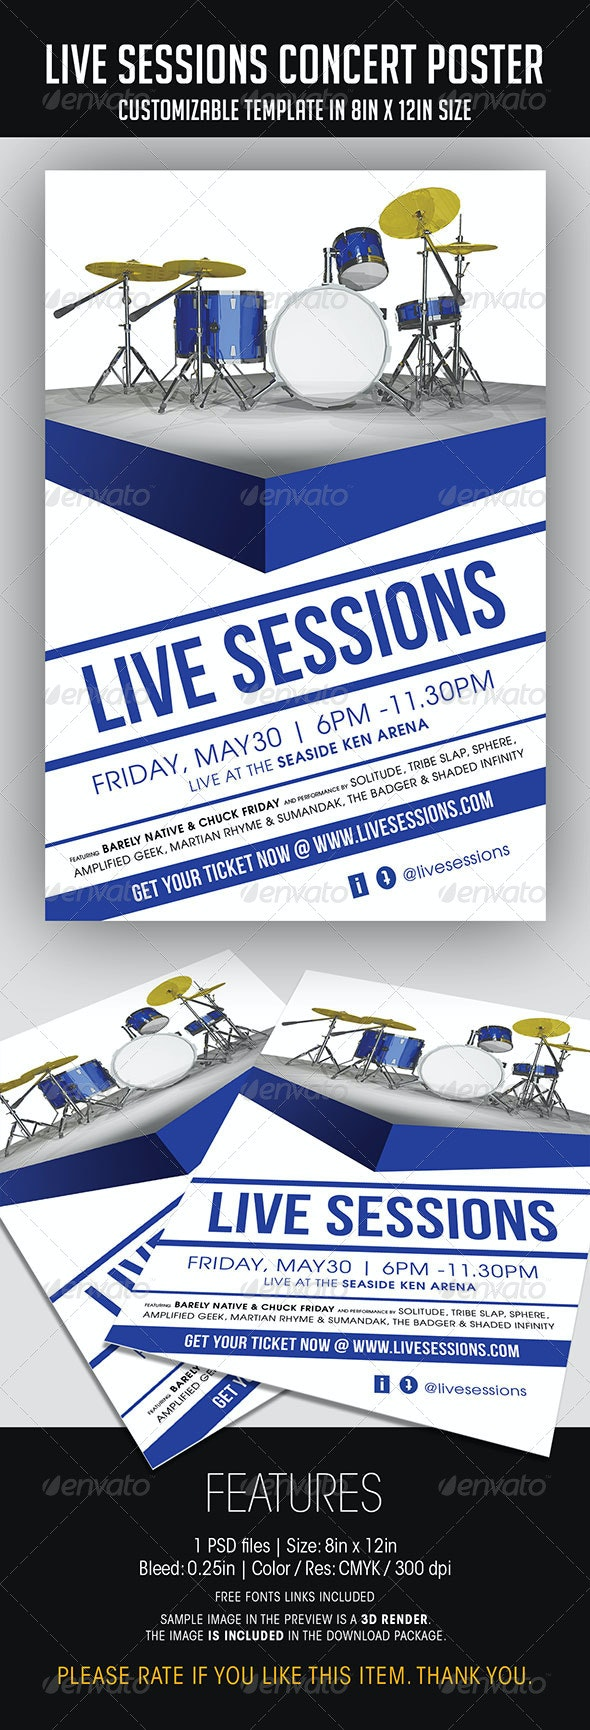 Live Session Concert Poster - Concerts Events